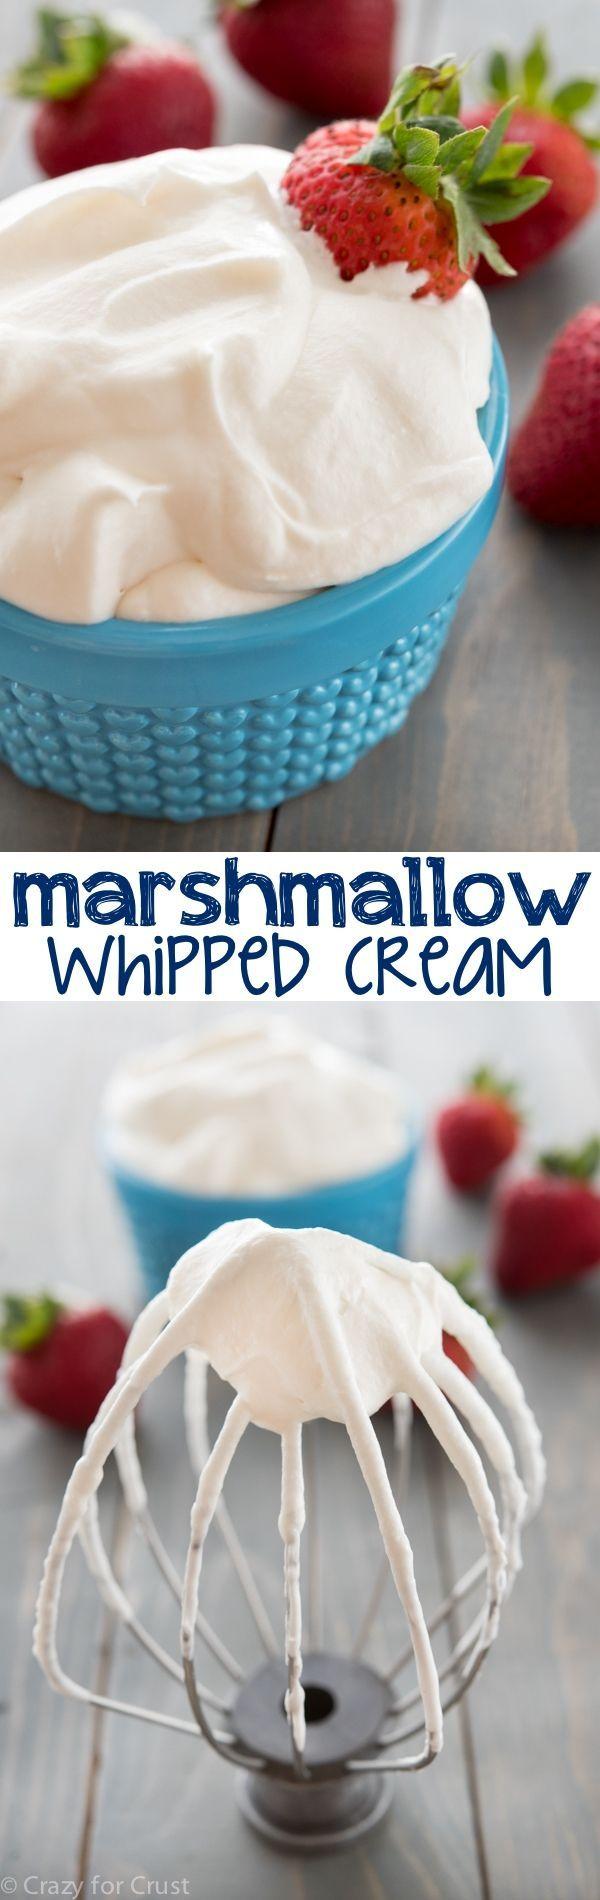 Marshmallow Whipped Cream